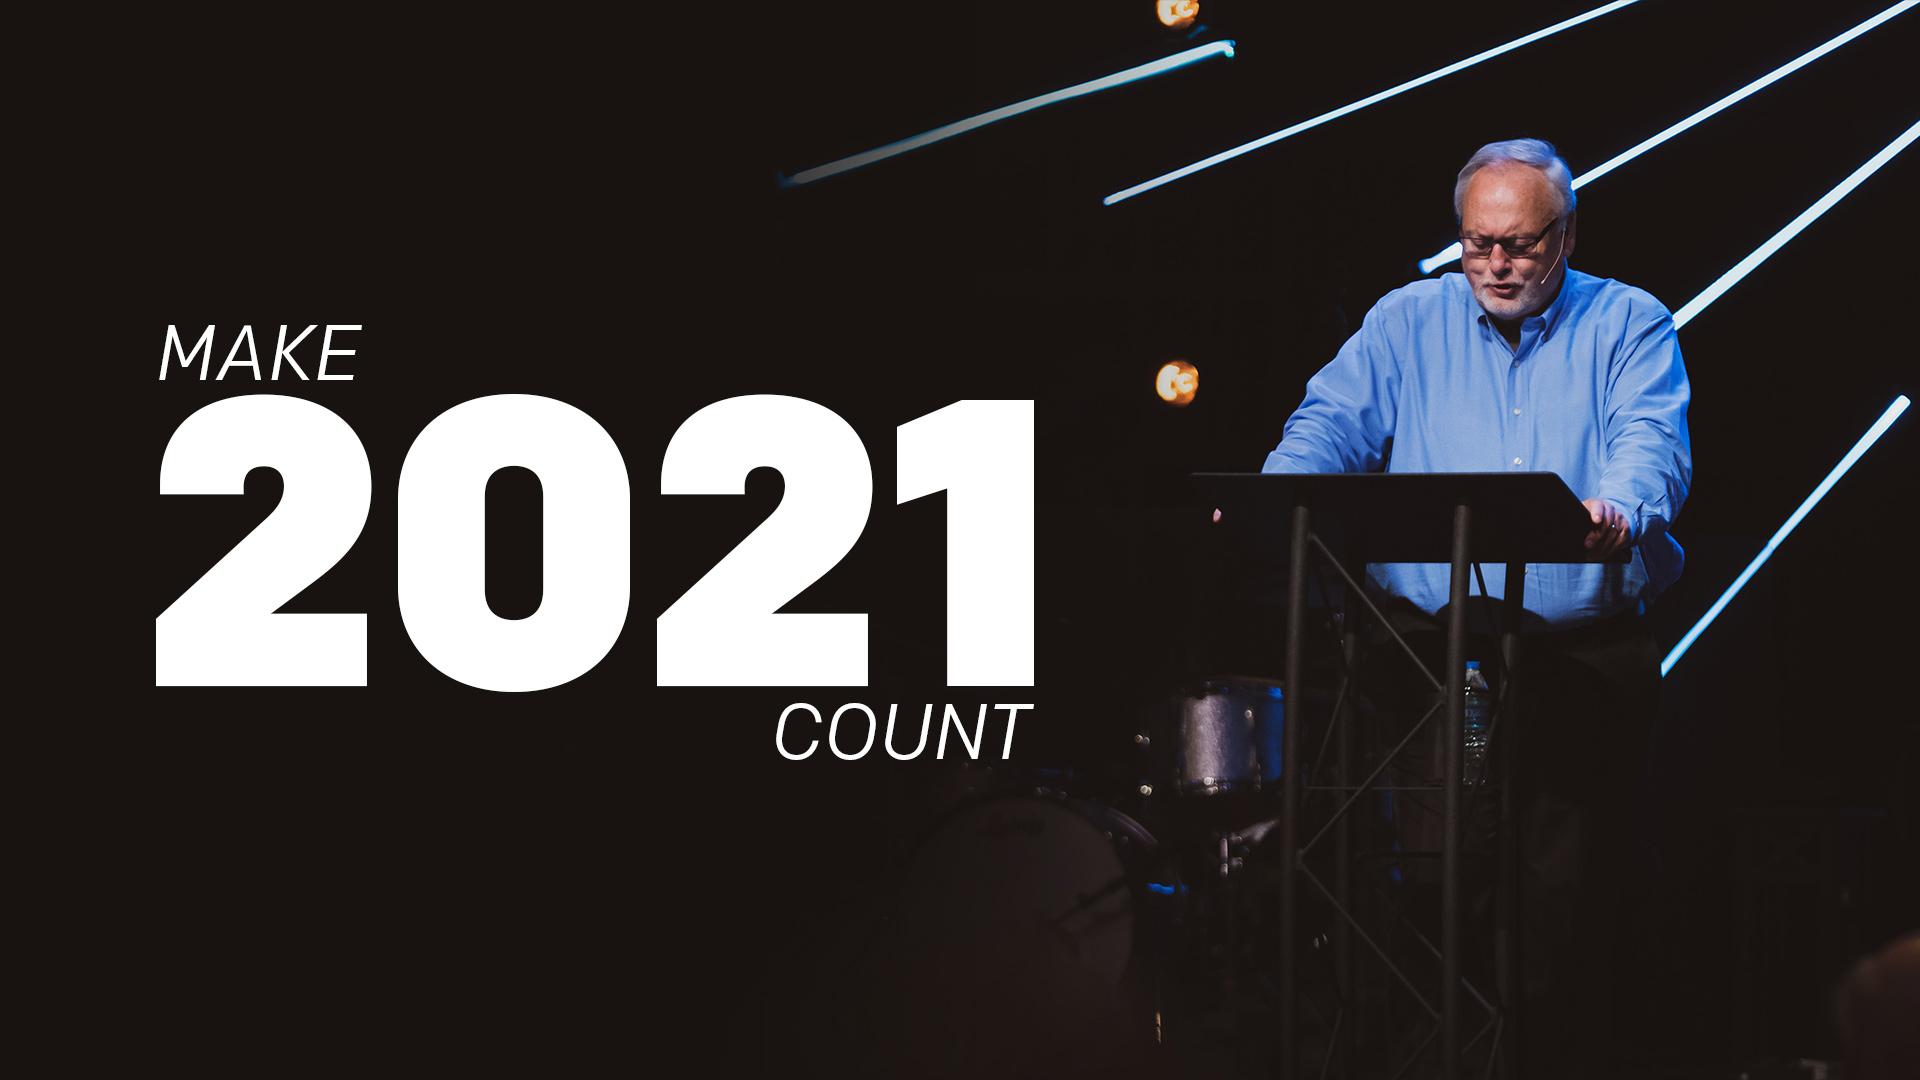 Make 2021 Count